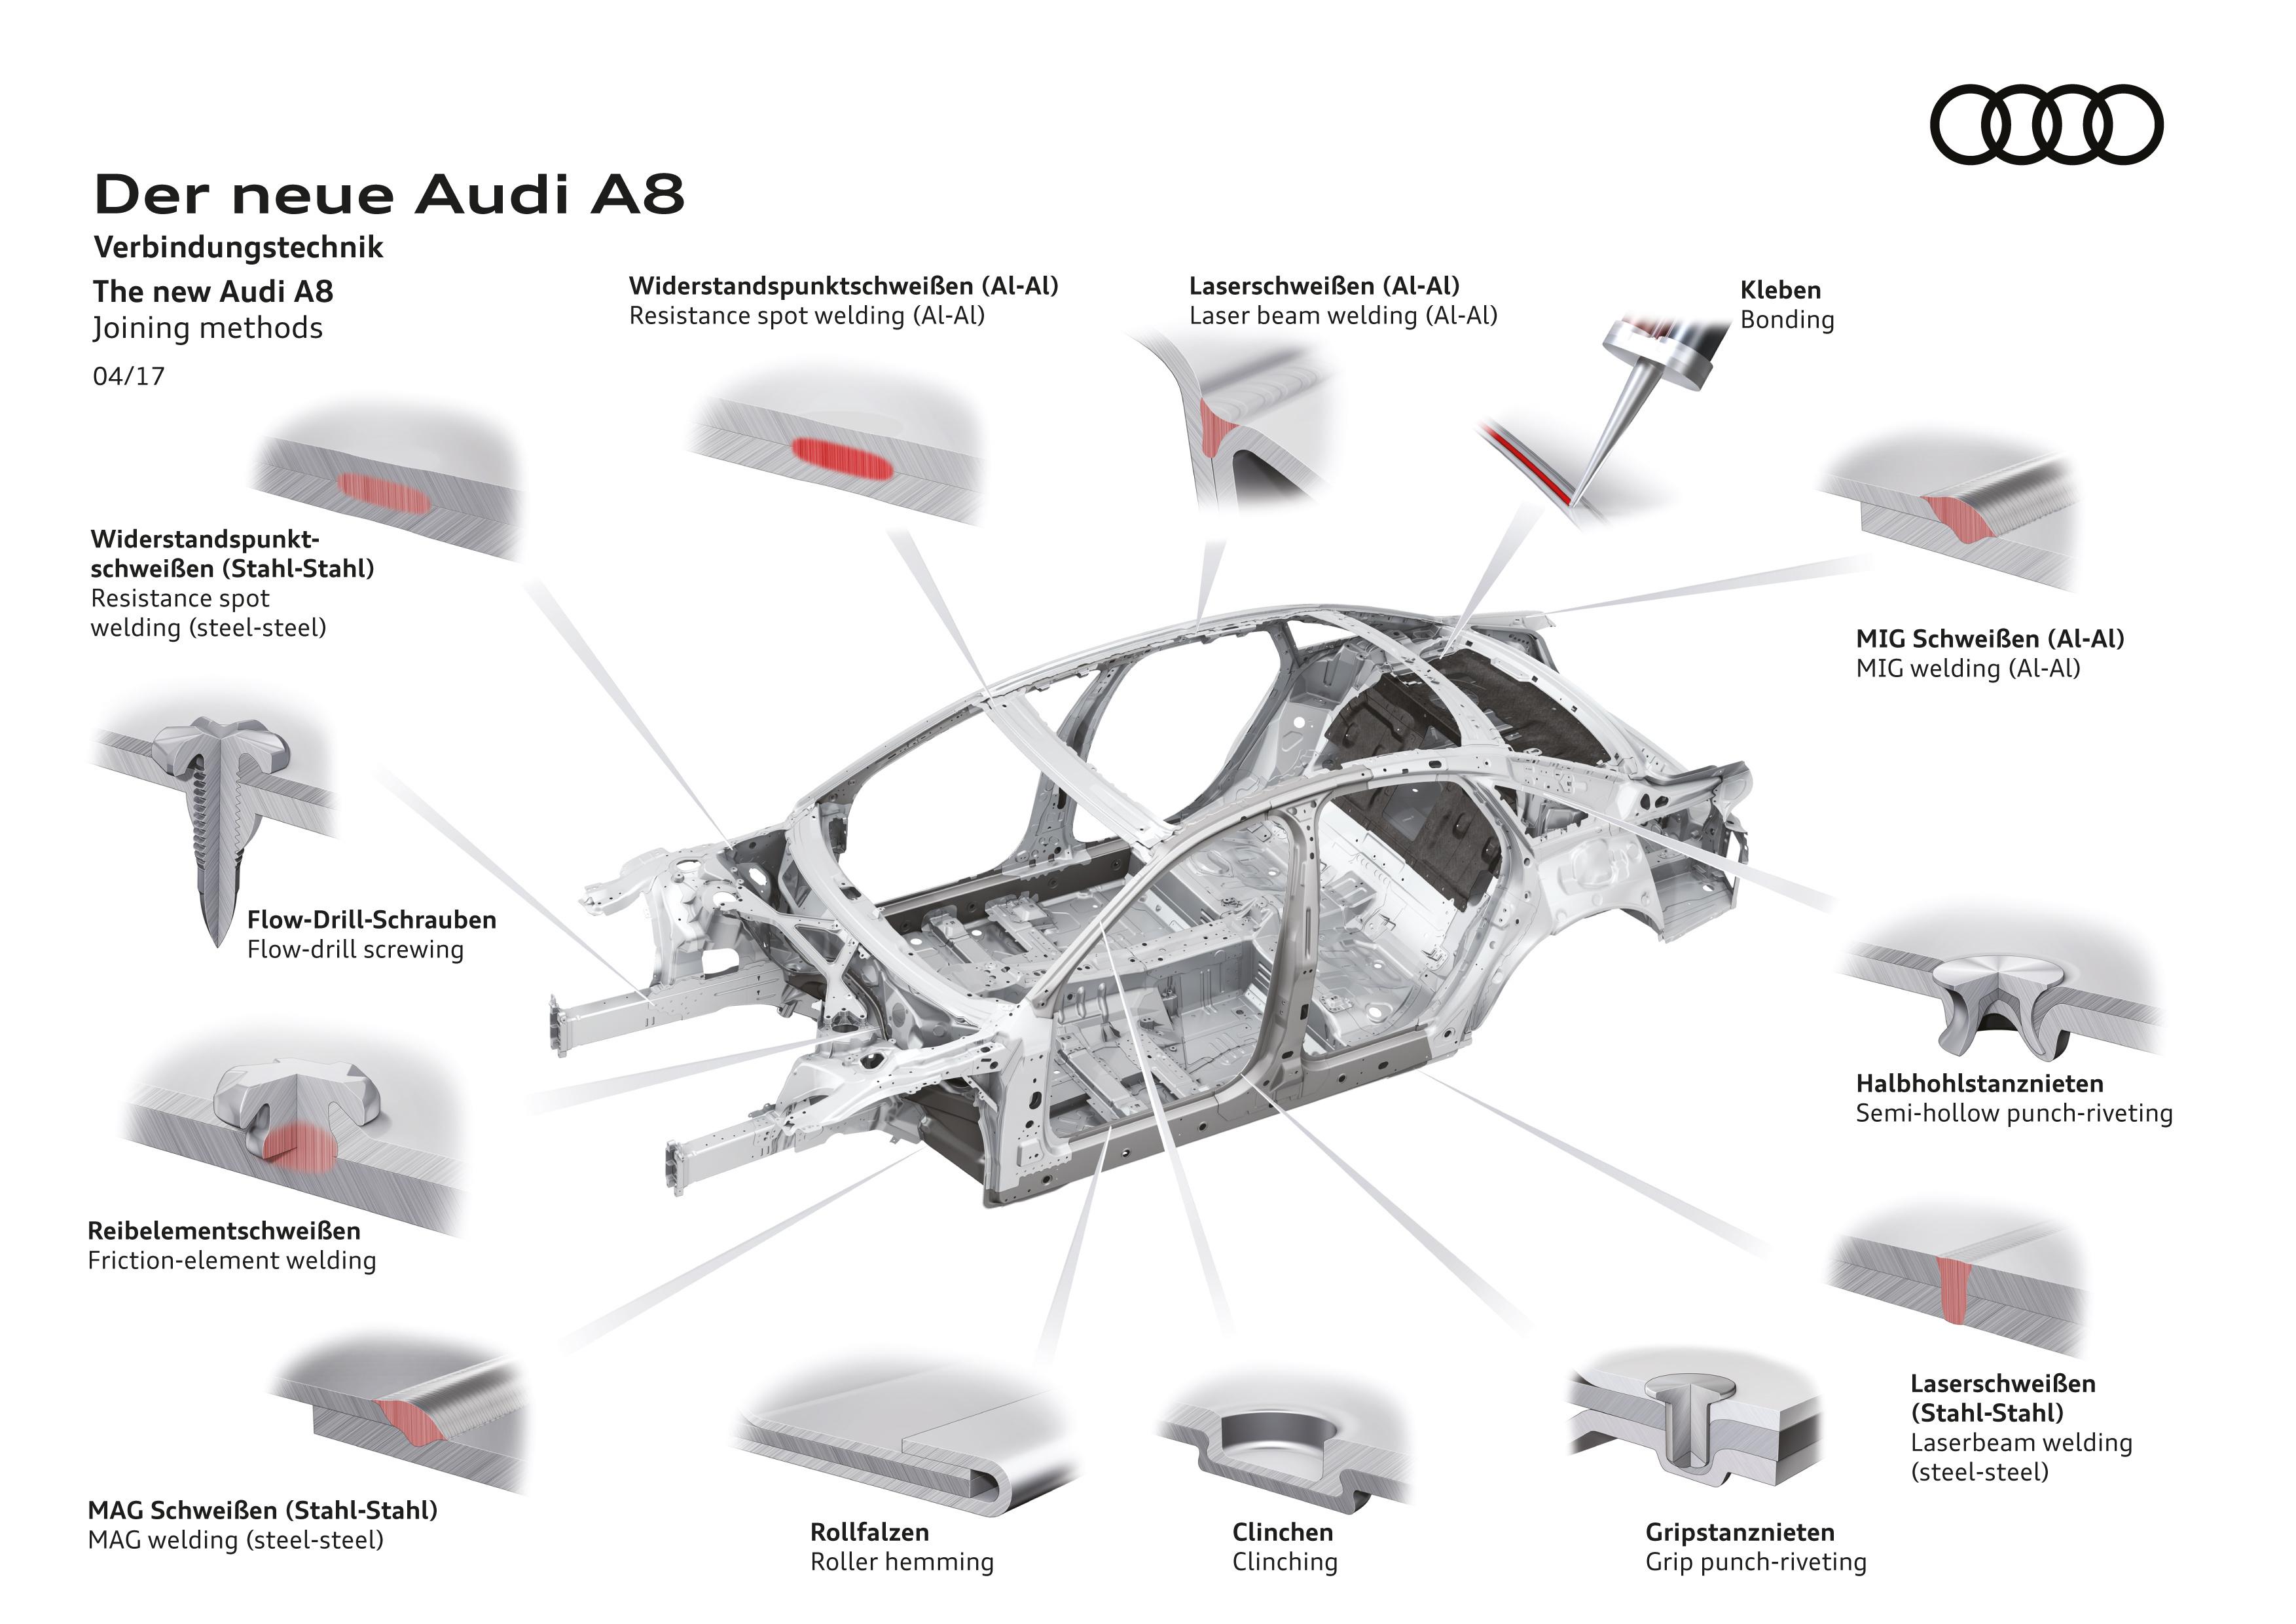 Upcoming Audi A8 Uses Uhss Aluminum Carbon Fiber